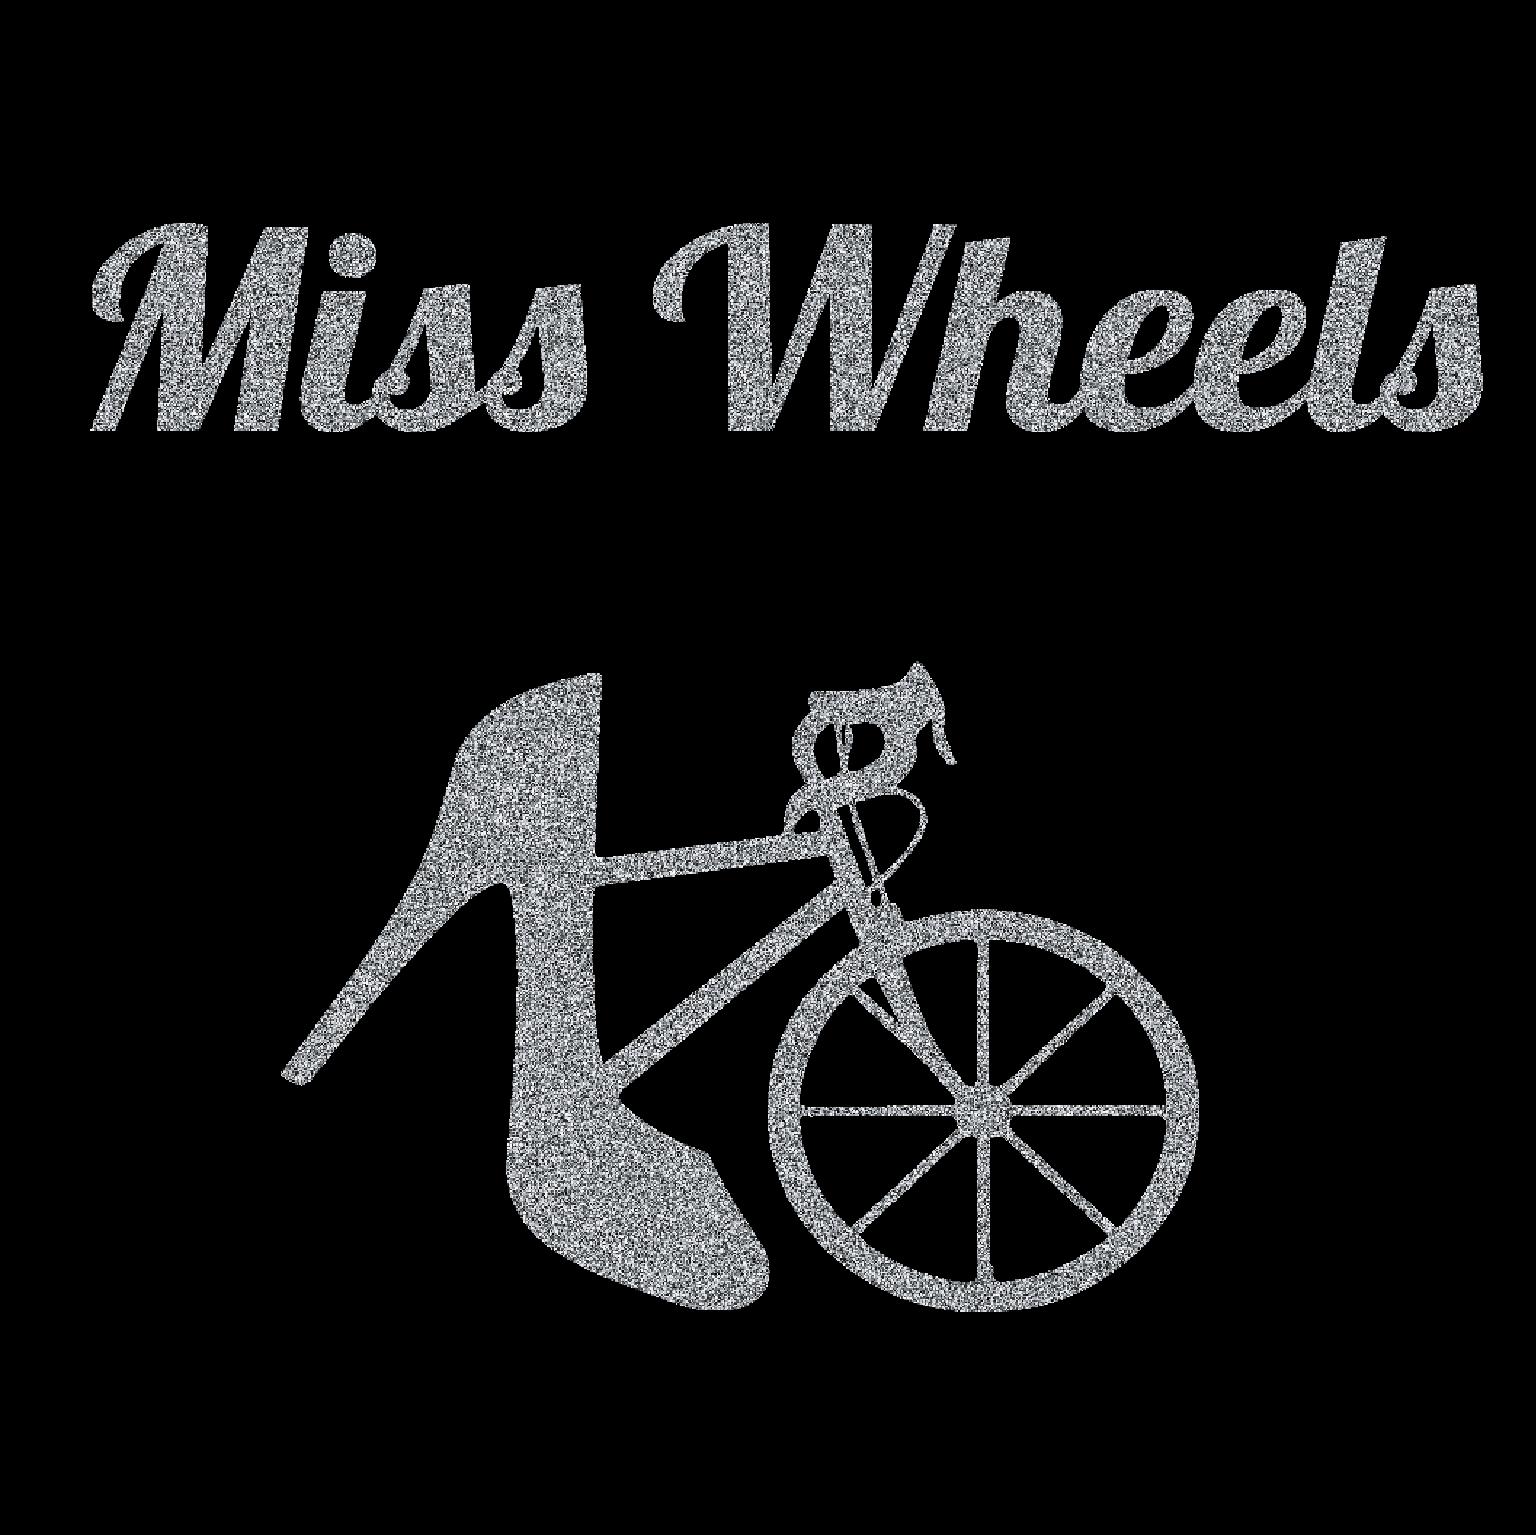 Miss Wheels